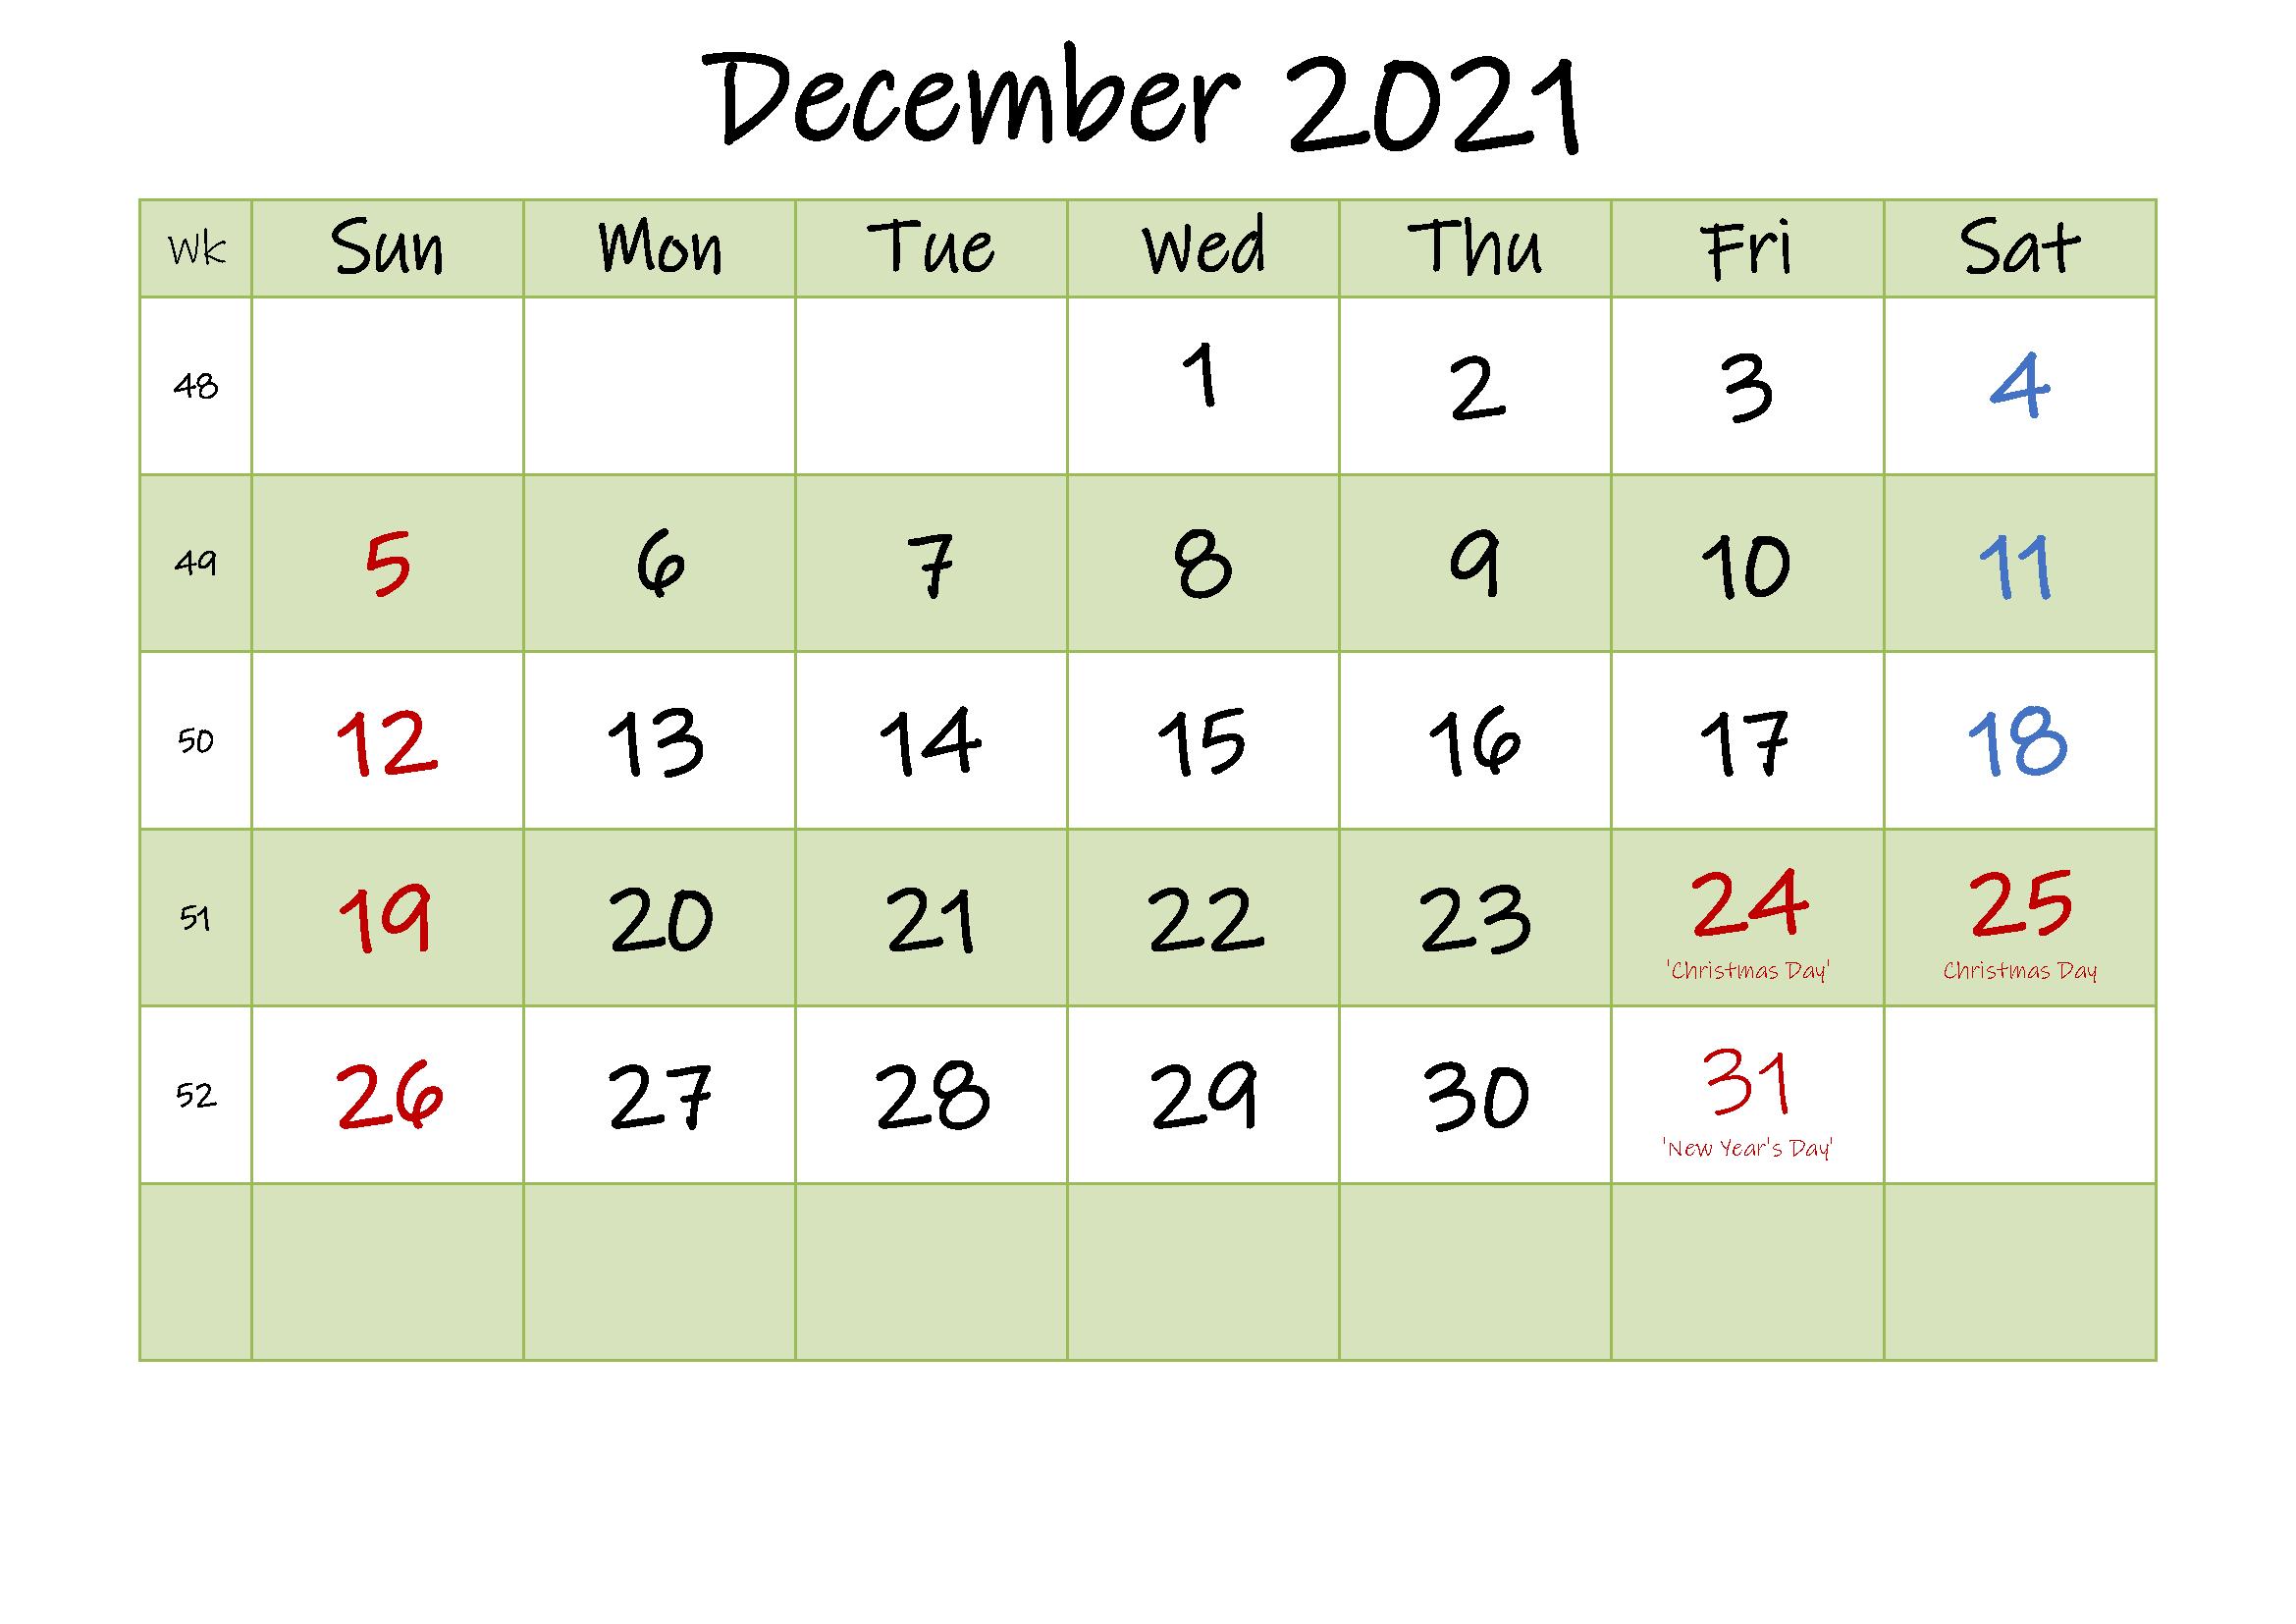 December 2021 Calendar Blank Word Template